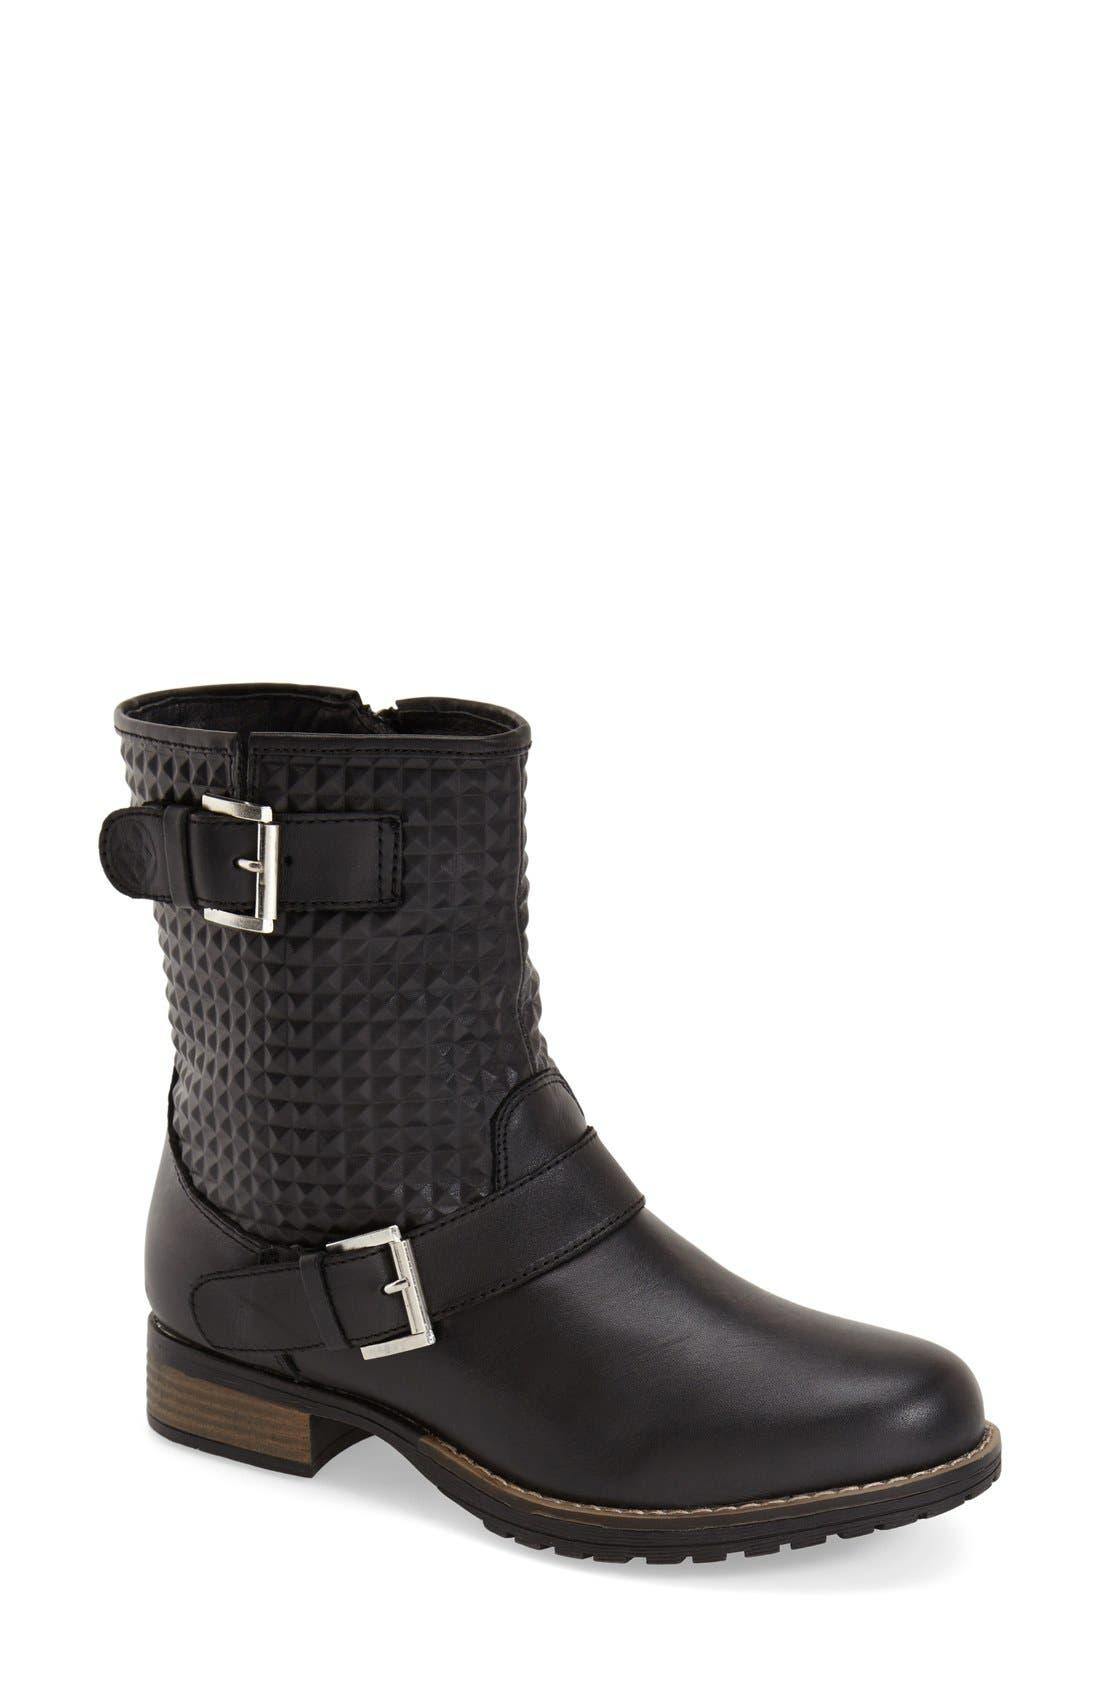 'Granada' Waterproof Pyramid Studded Boot,                         Main,                         color, Black